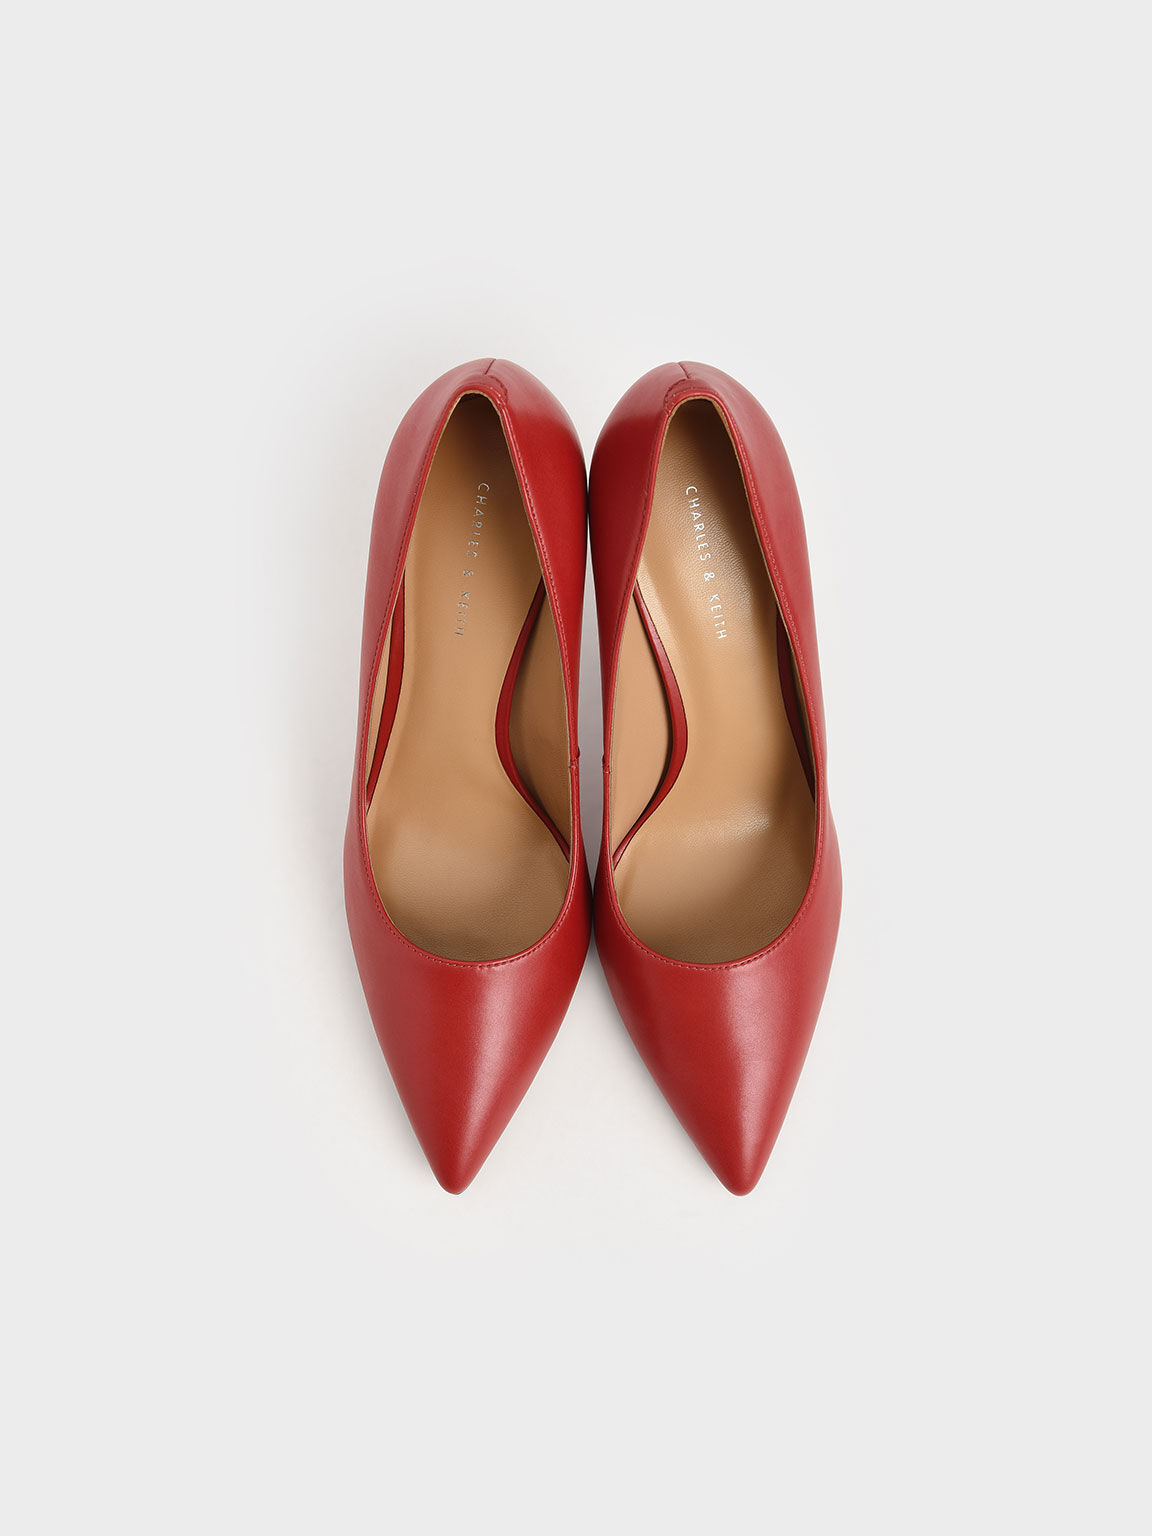 Spool Heel Pointed Toe Pumps, Red, hi-res